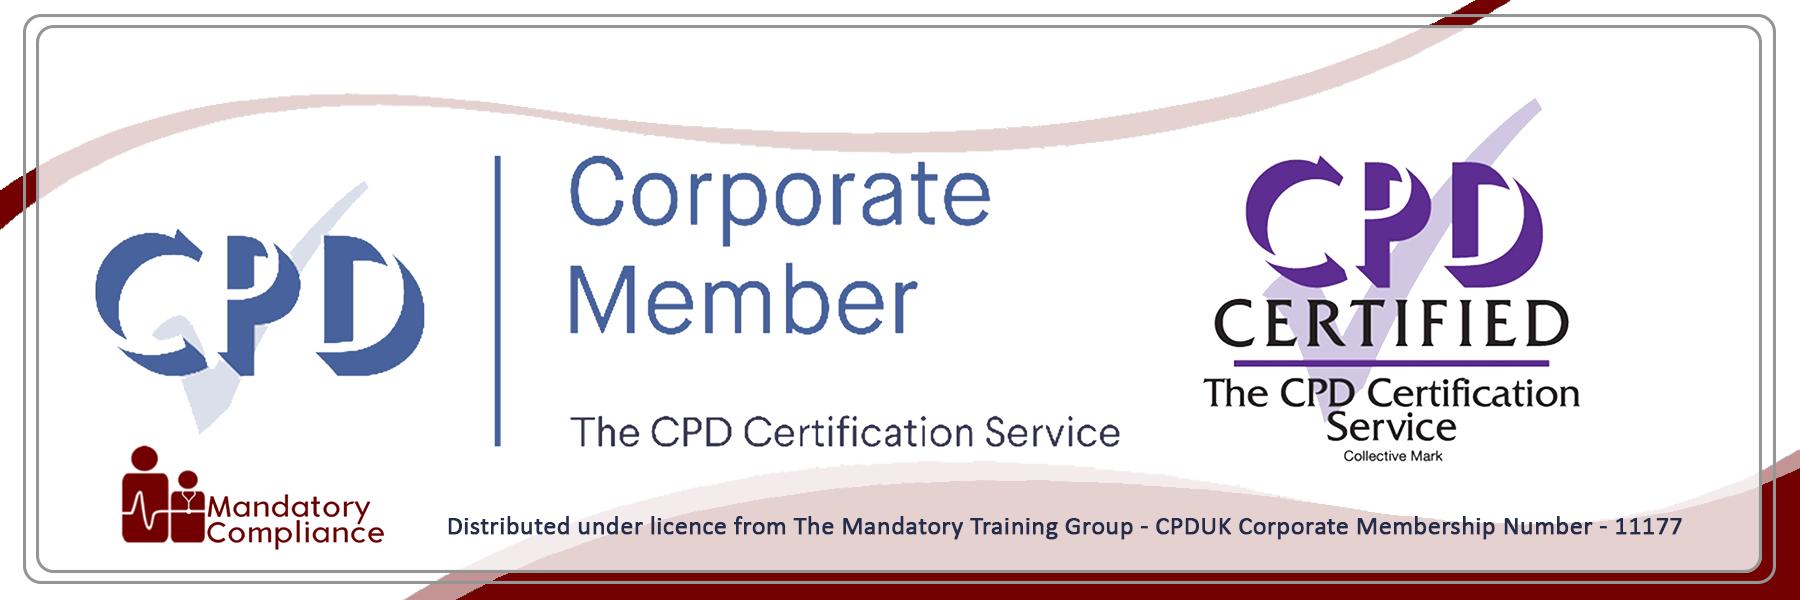 Designated Safeguarding Children Lead Training Programme -Online Training Package - Mandatory Compliance UK-